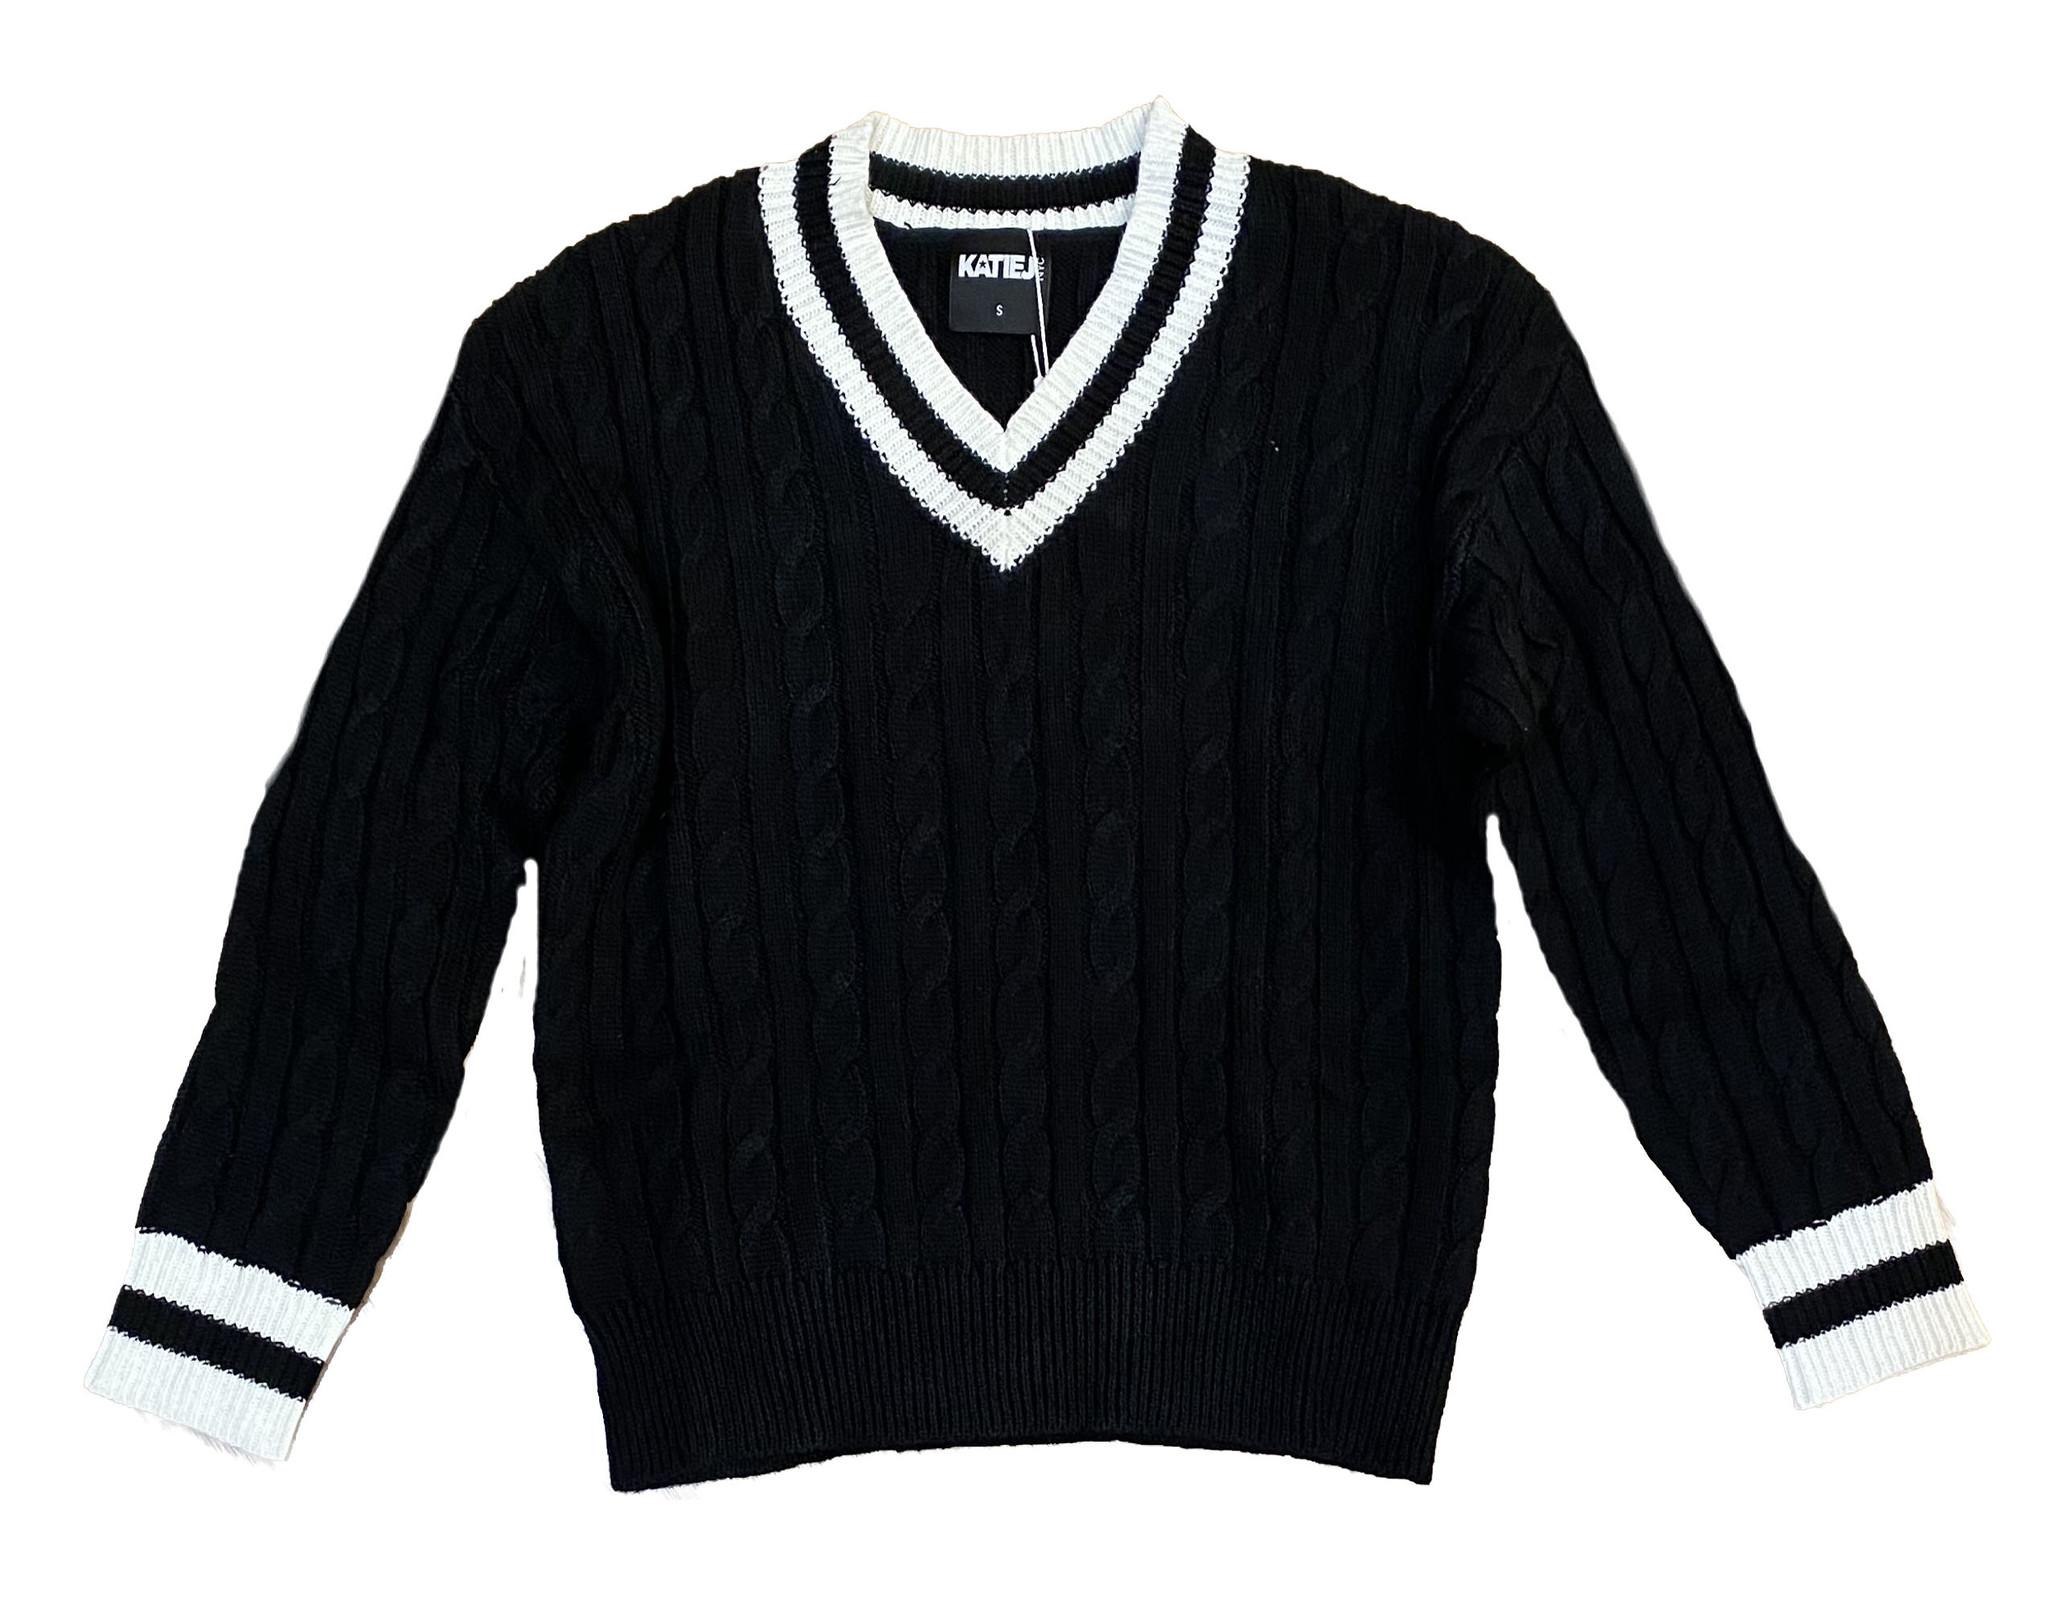 Katie J NYC Black Blair Sweater